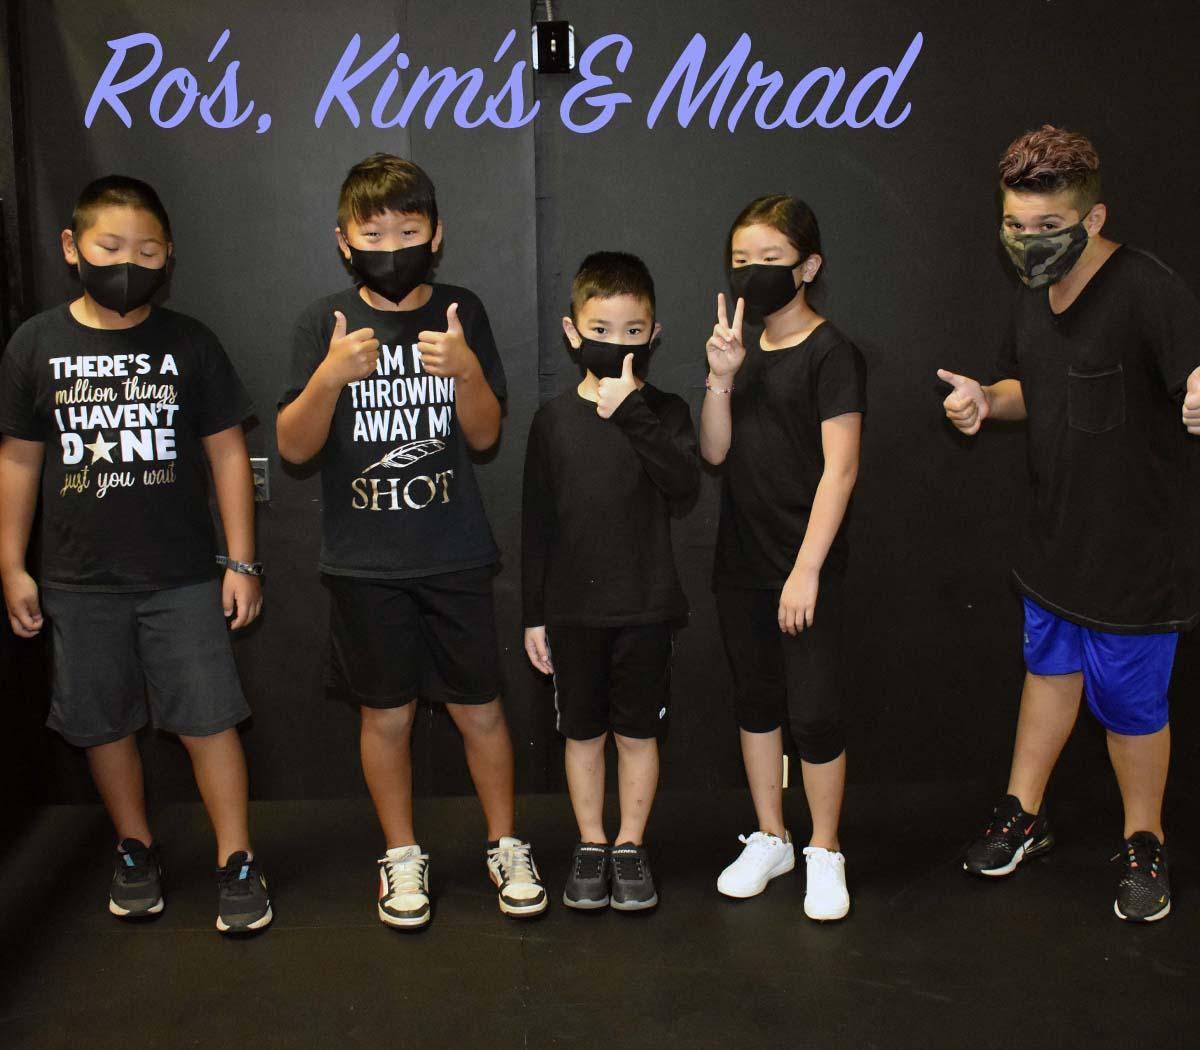 ro kim and mrad